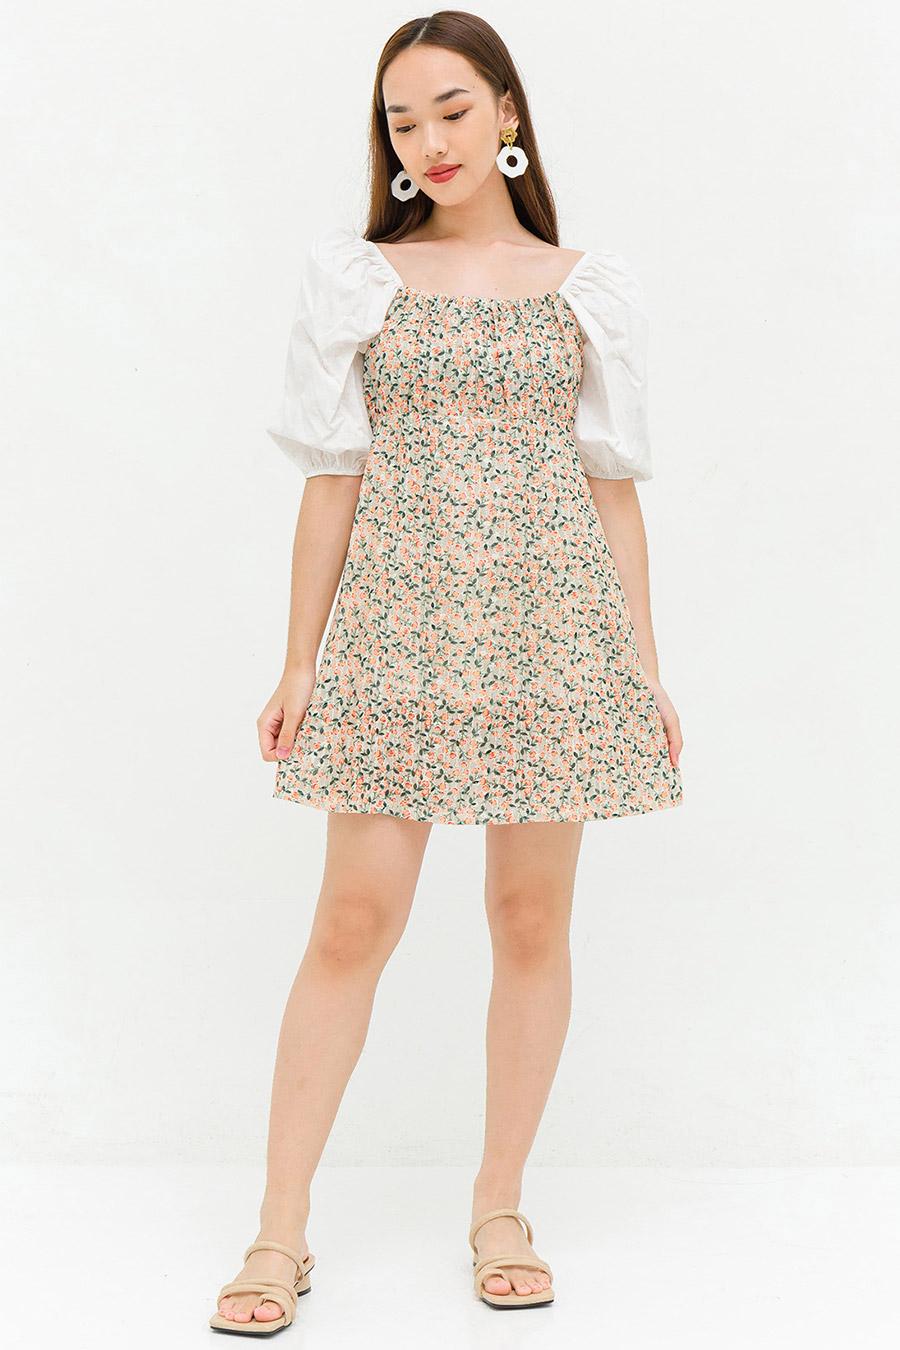 IVY DRESS - IVORY FLEUR